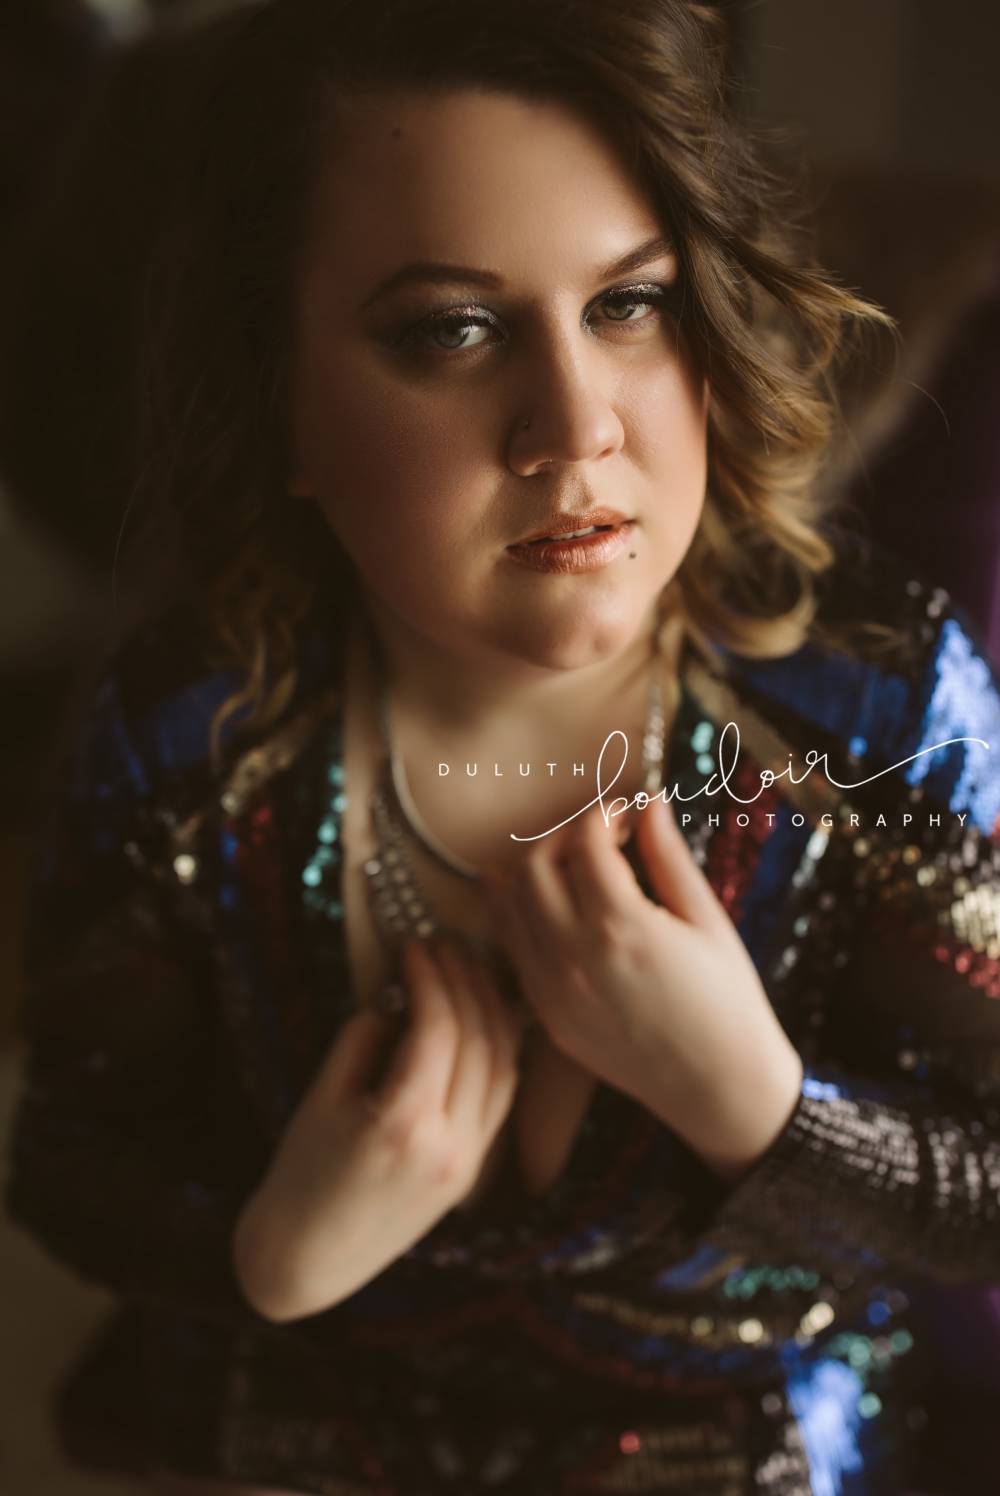 Rachel-D-Duluth-Boudoir-Photography-14.jpg